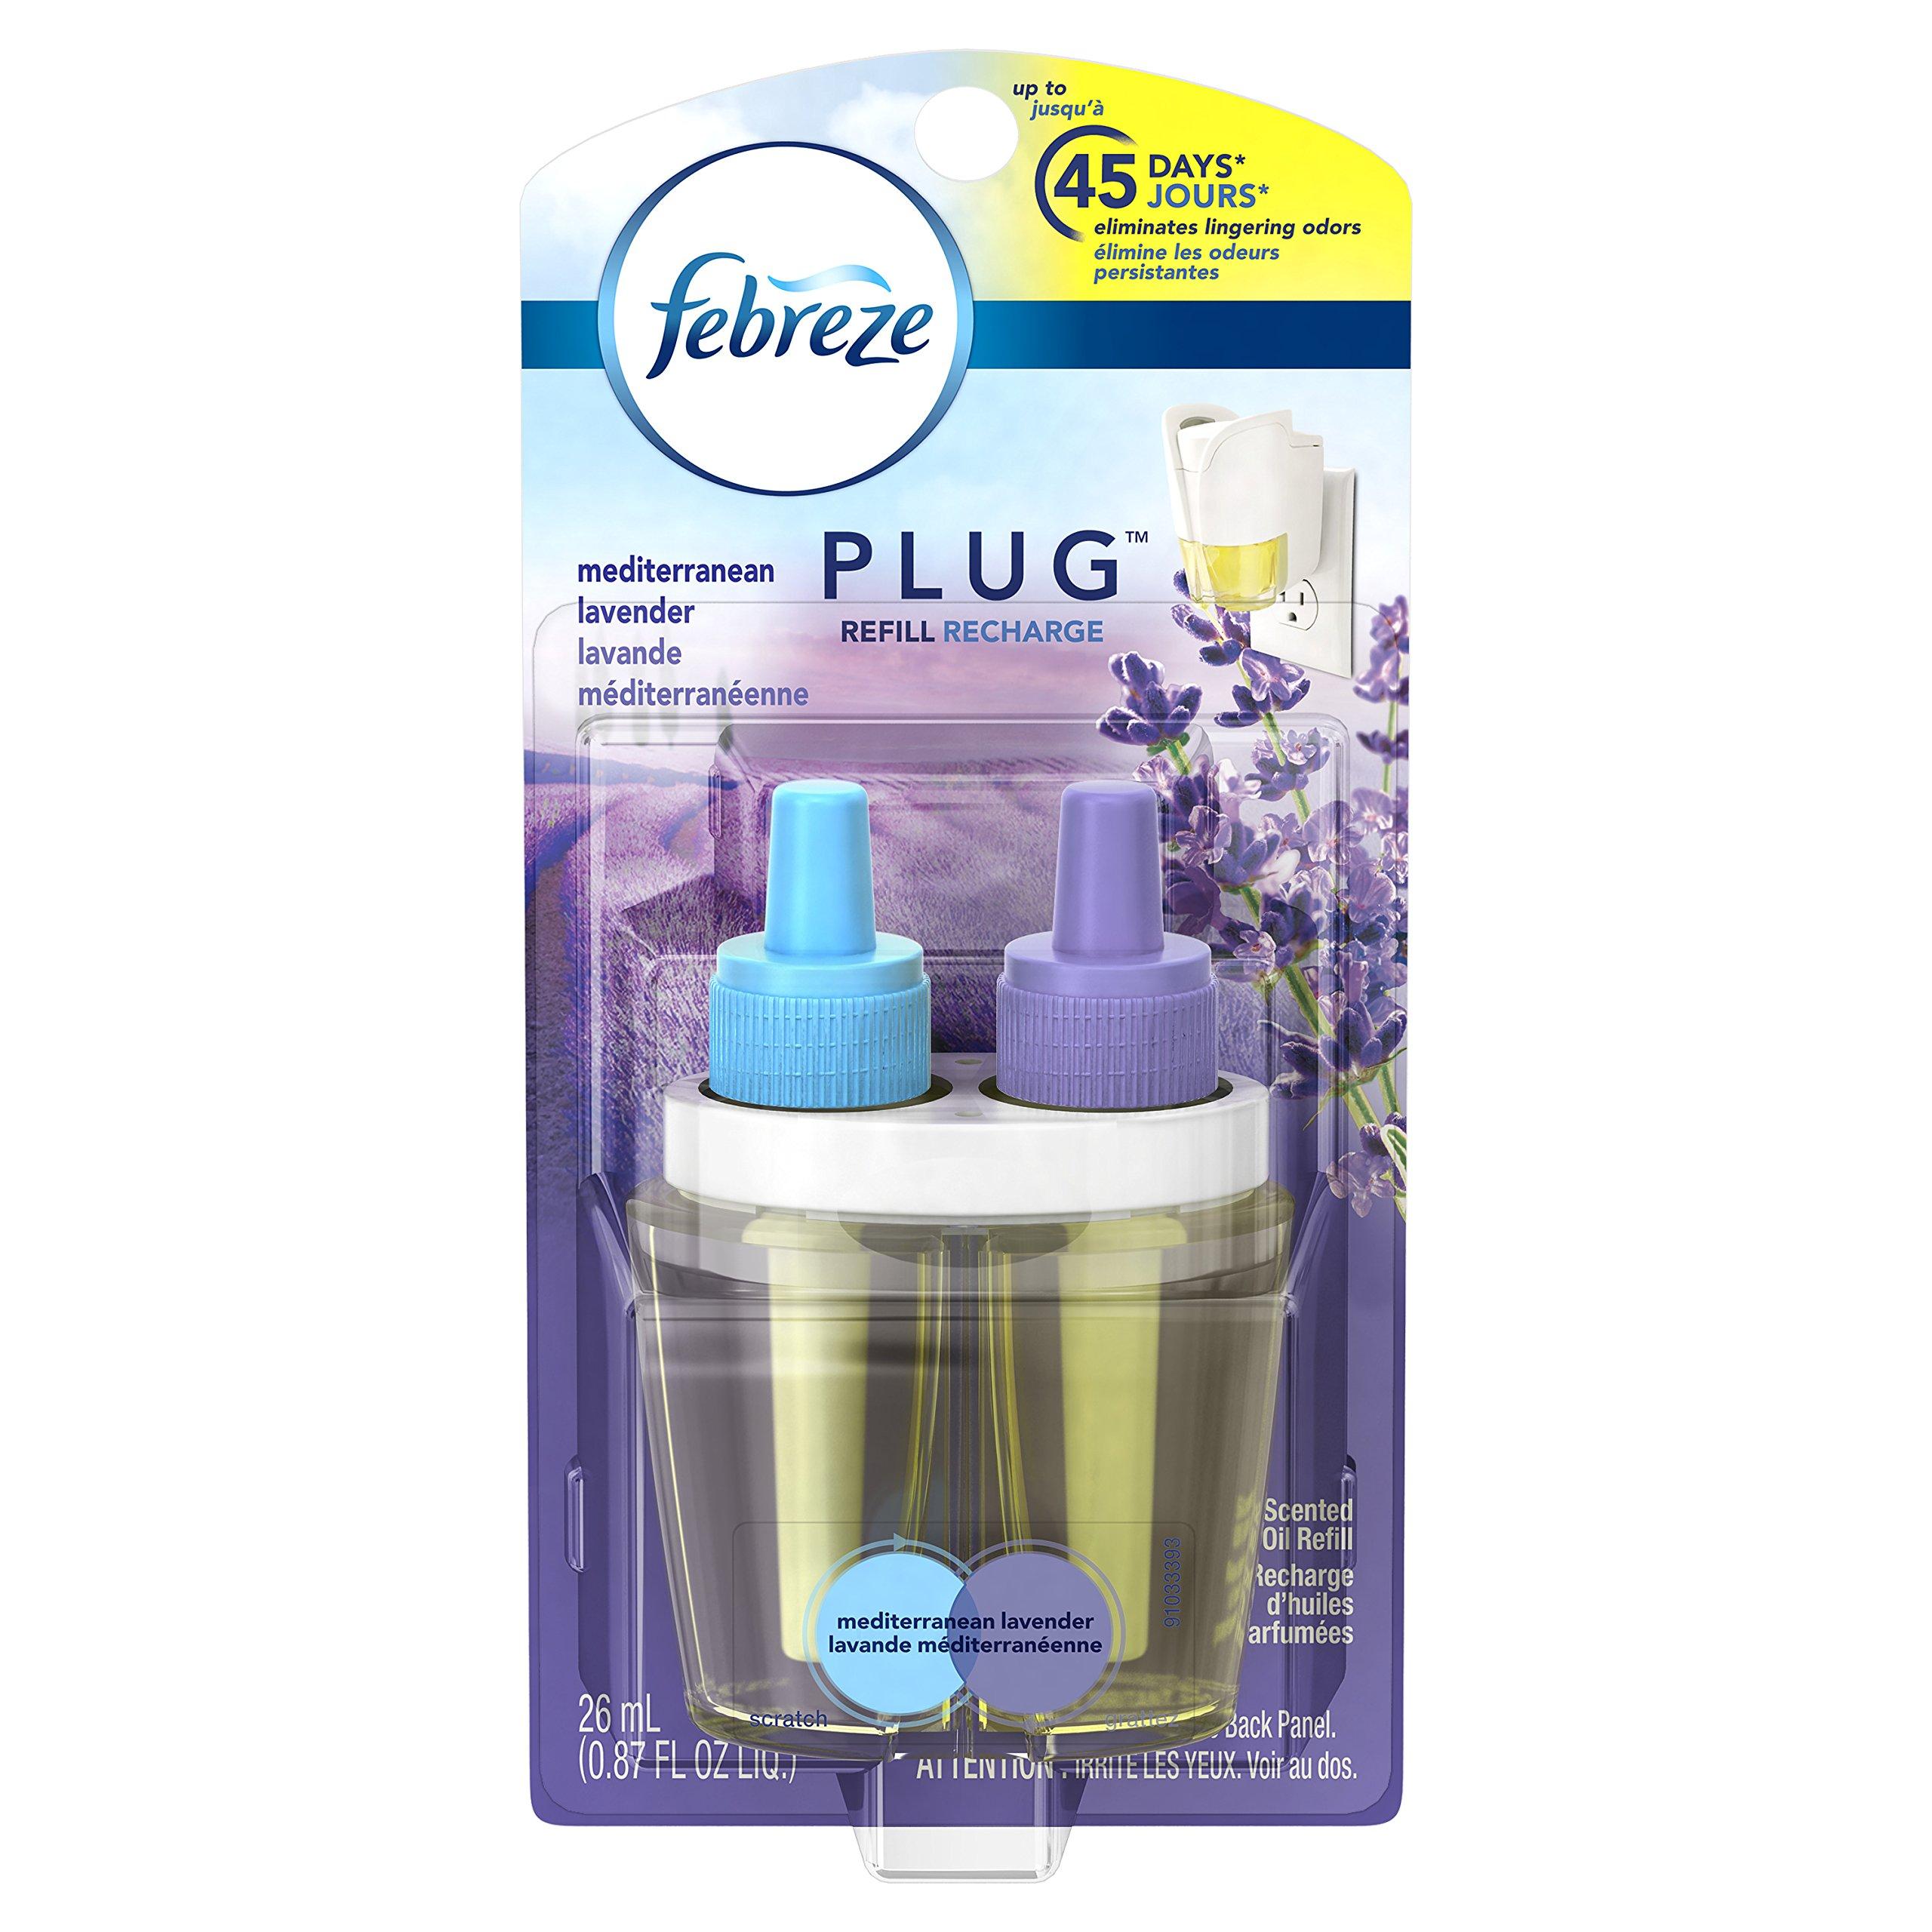 Febreze Air Freshener, Noticeables Air Freshener, Mediterranean Lavender Single Oil Refill Air Freshener, (1 Count, 0.87 Oz)